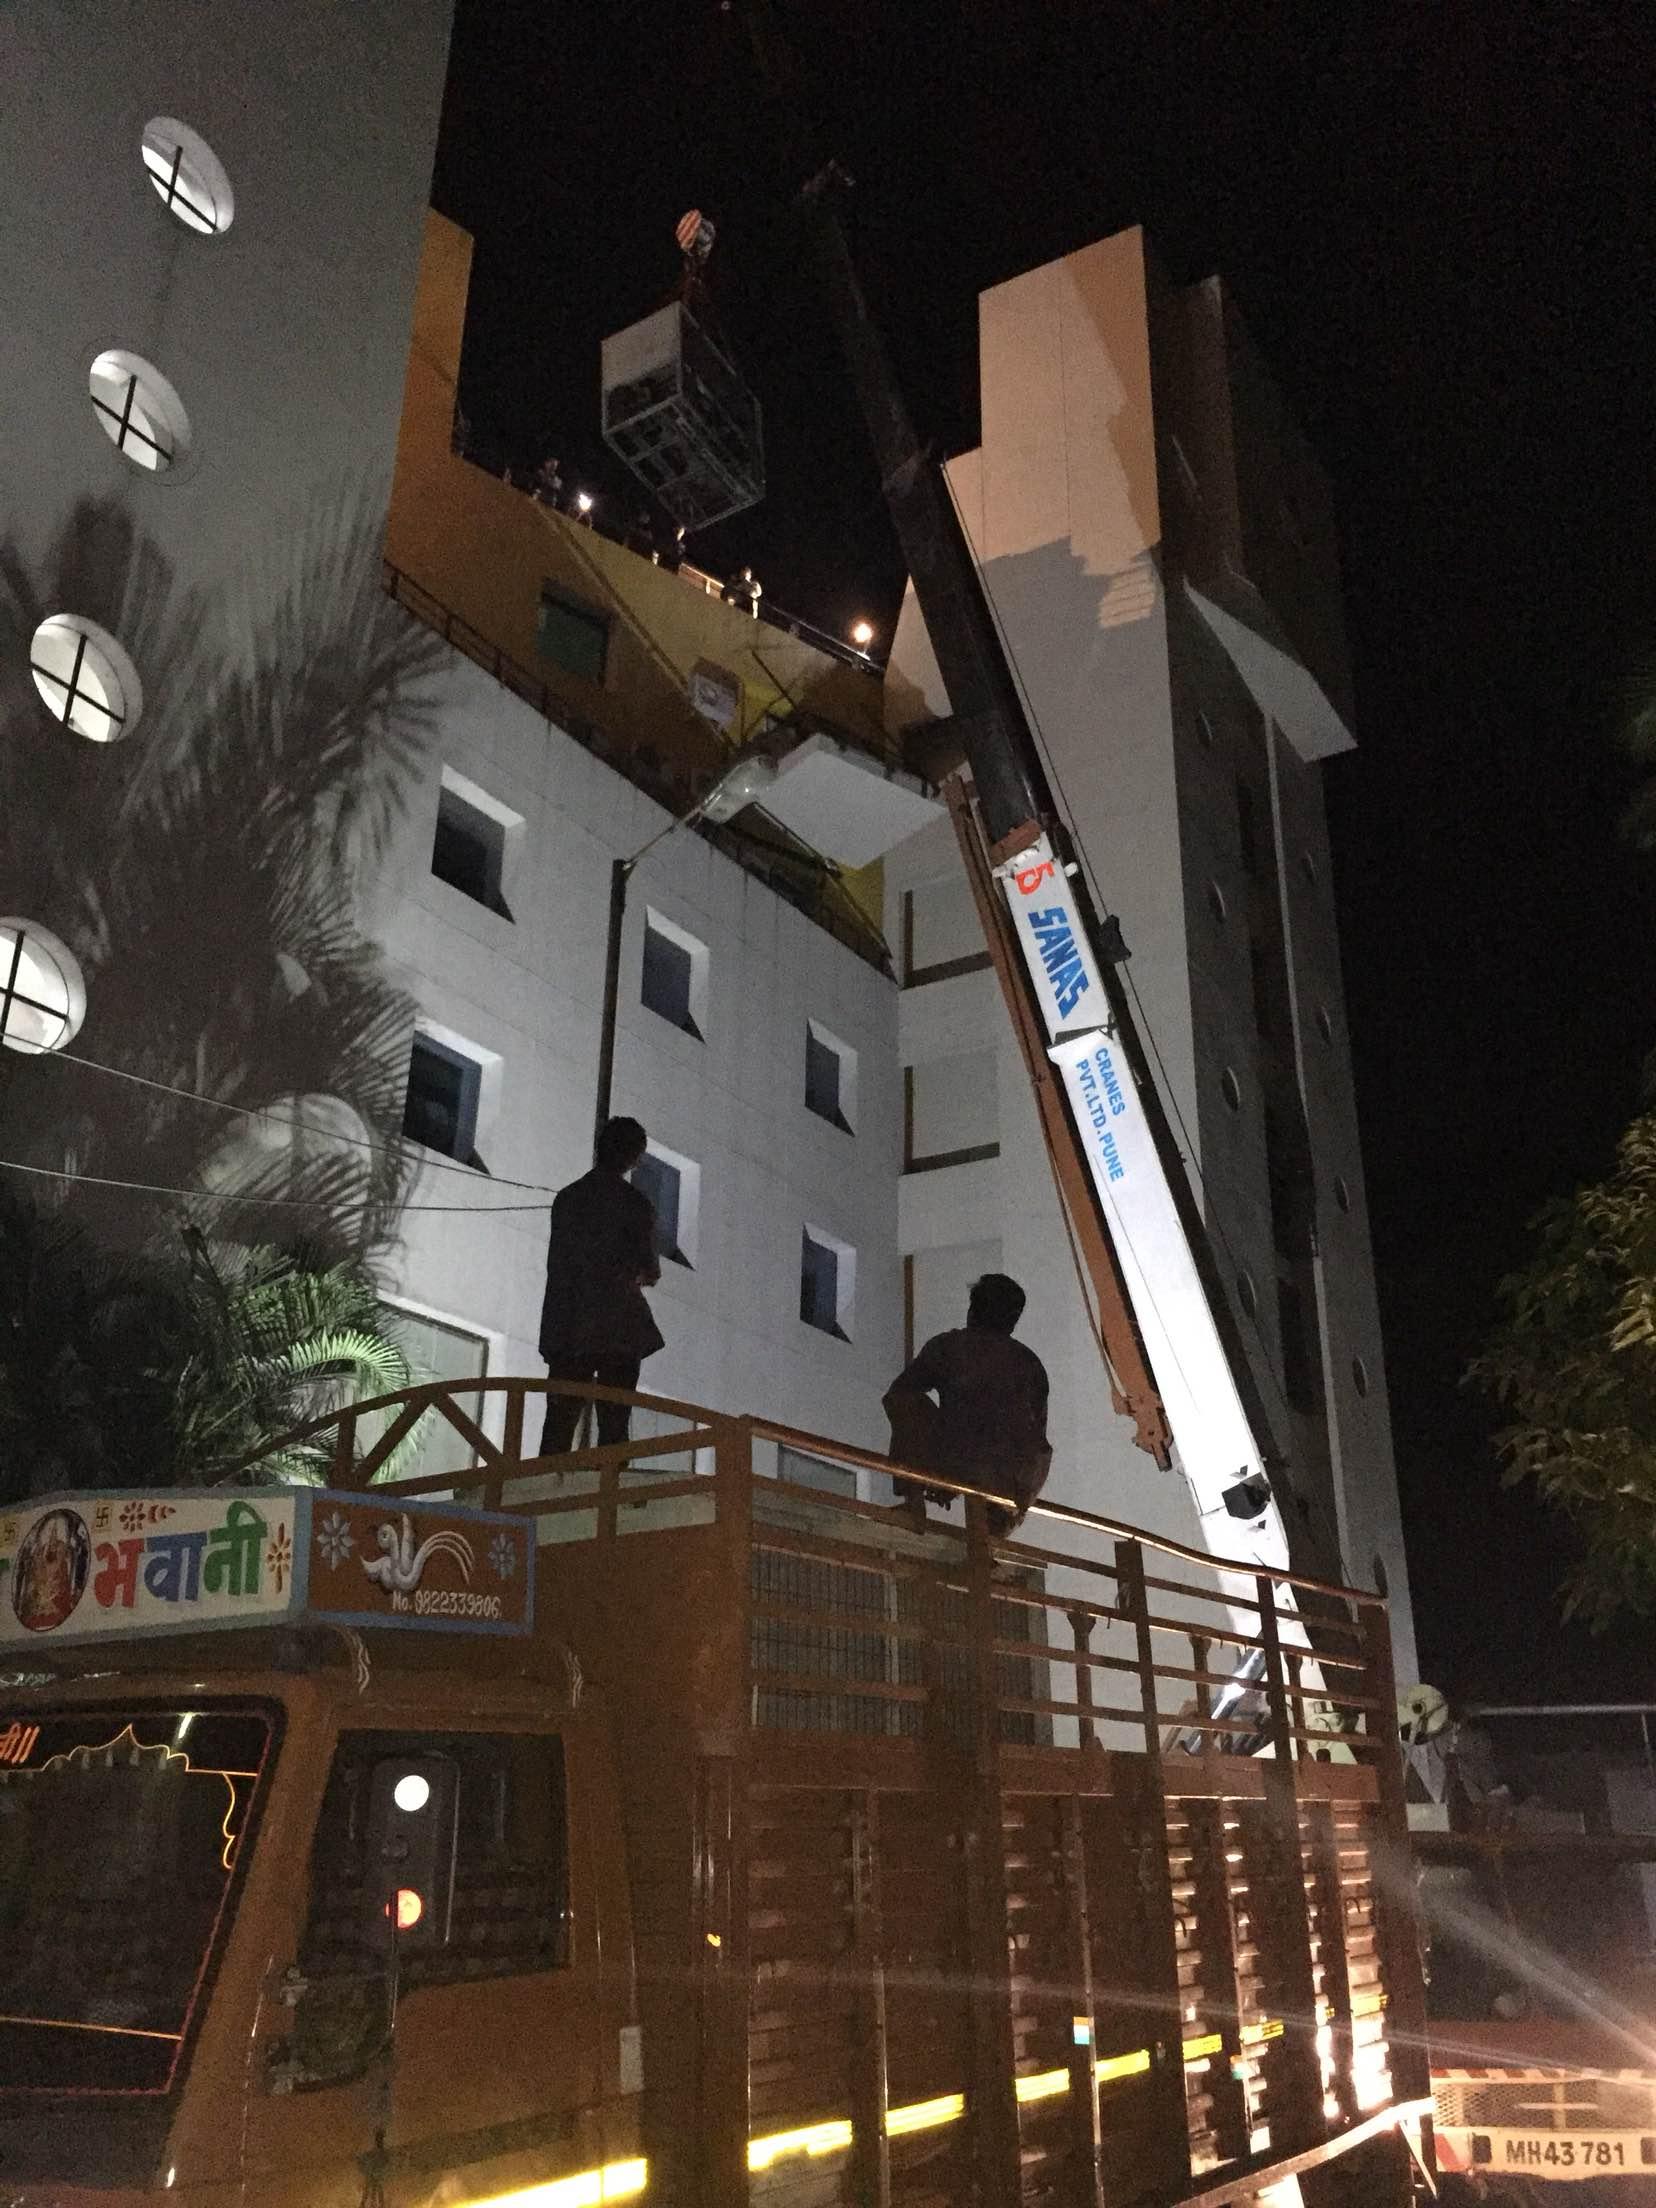 #50T crane#Night work#Pune#Pimpri#Chakan#Hydraulic Cranes#12T to150T#Manual machinery shifting